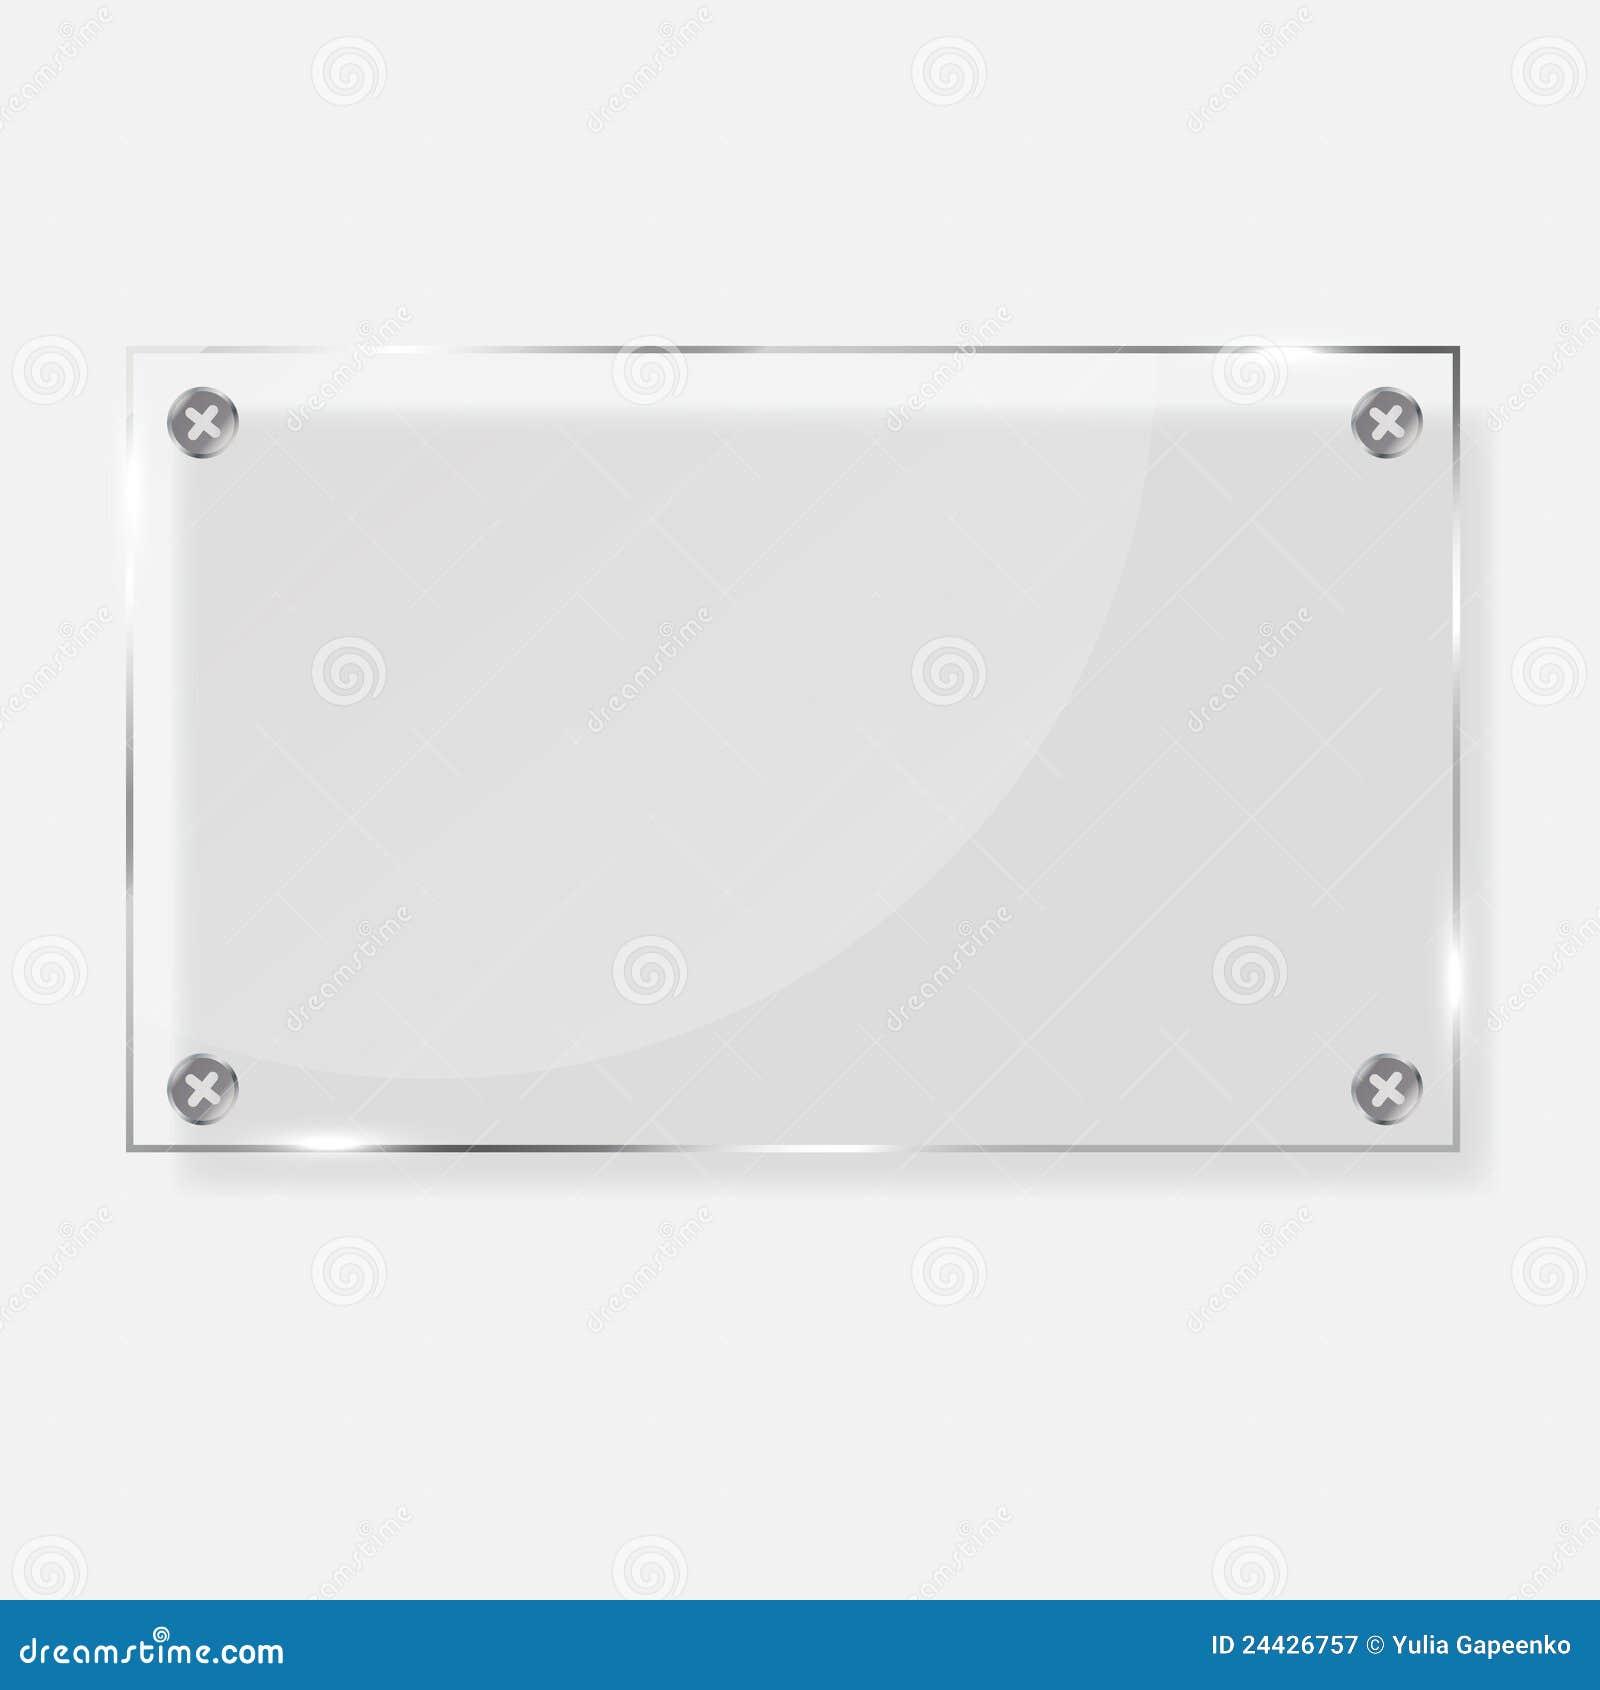 Realistic Glass Frames. Vector Illustration. Stock Vector ...